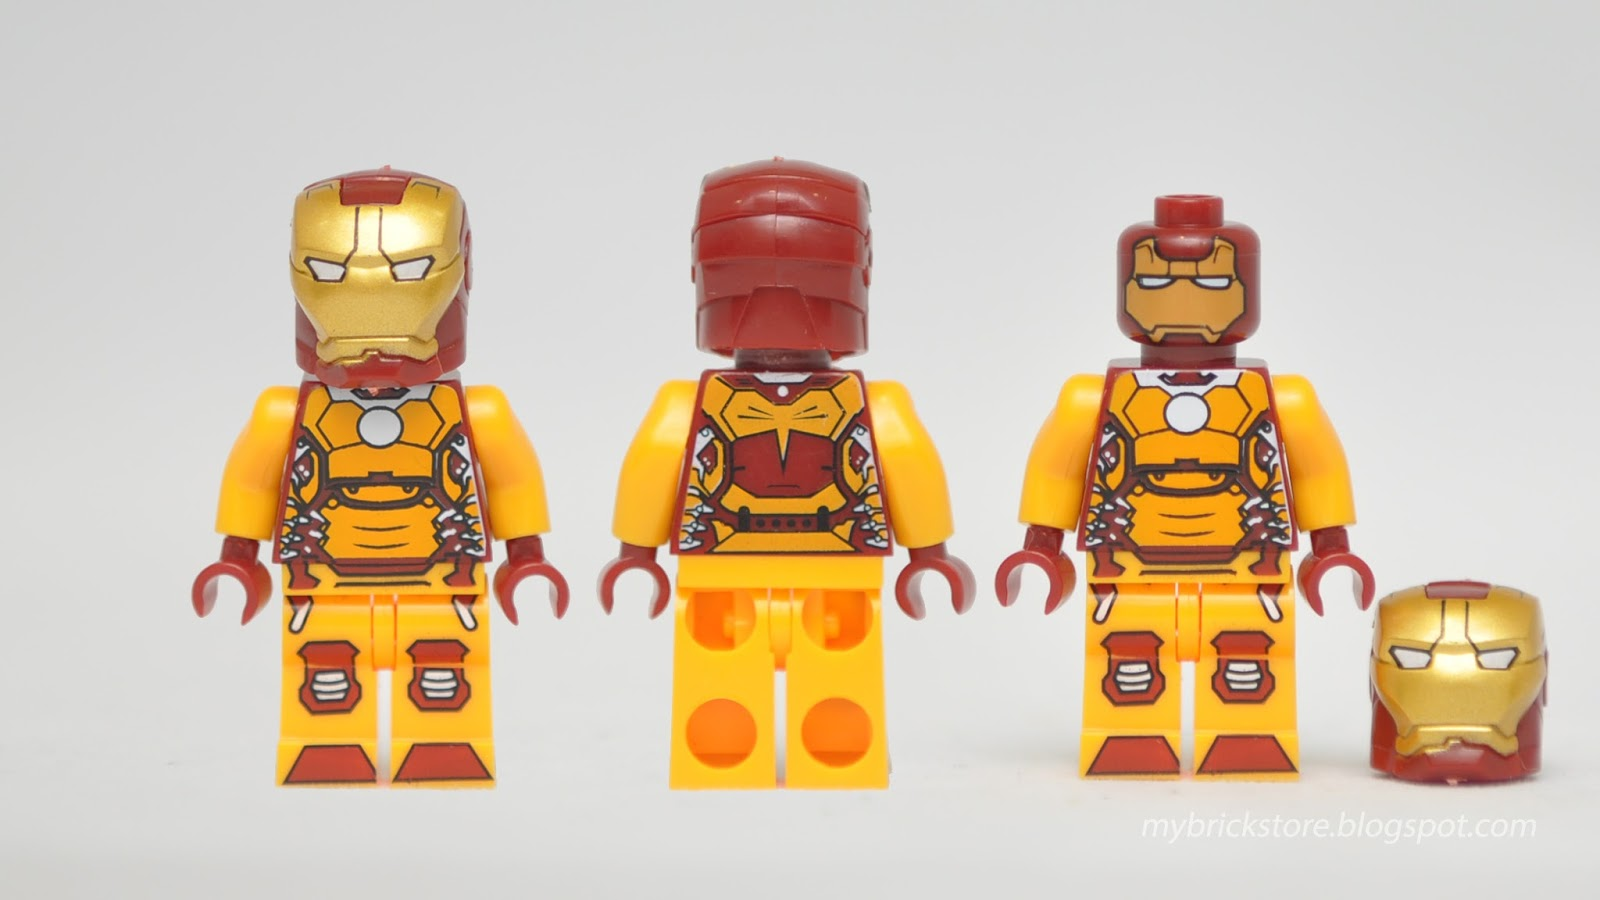 2 mark 42 rubber ducky iron man extremis armor from iron man 3 bootleg iron man 2 starring